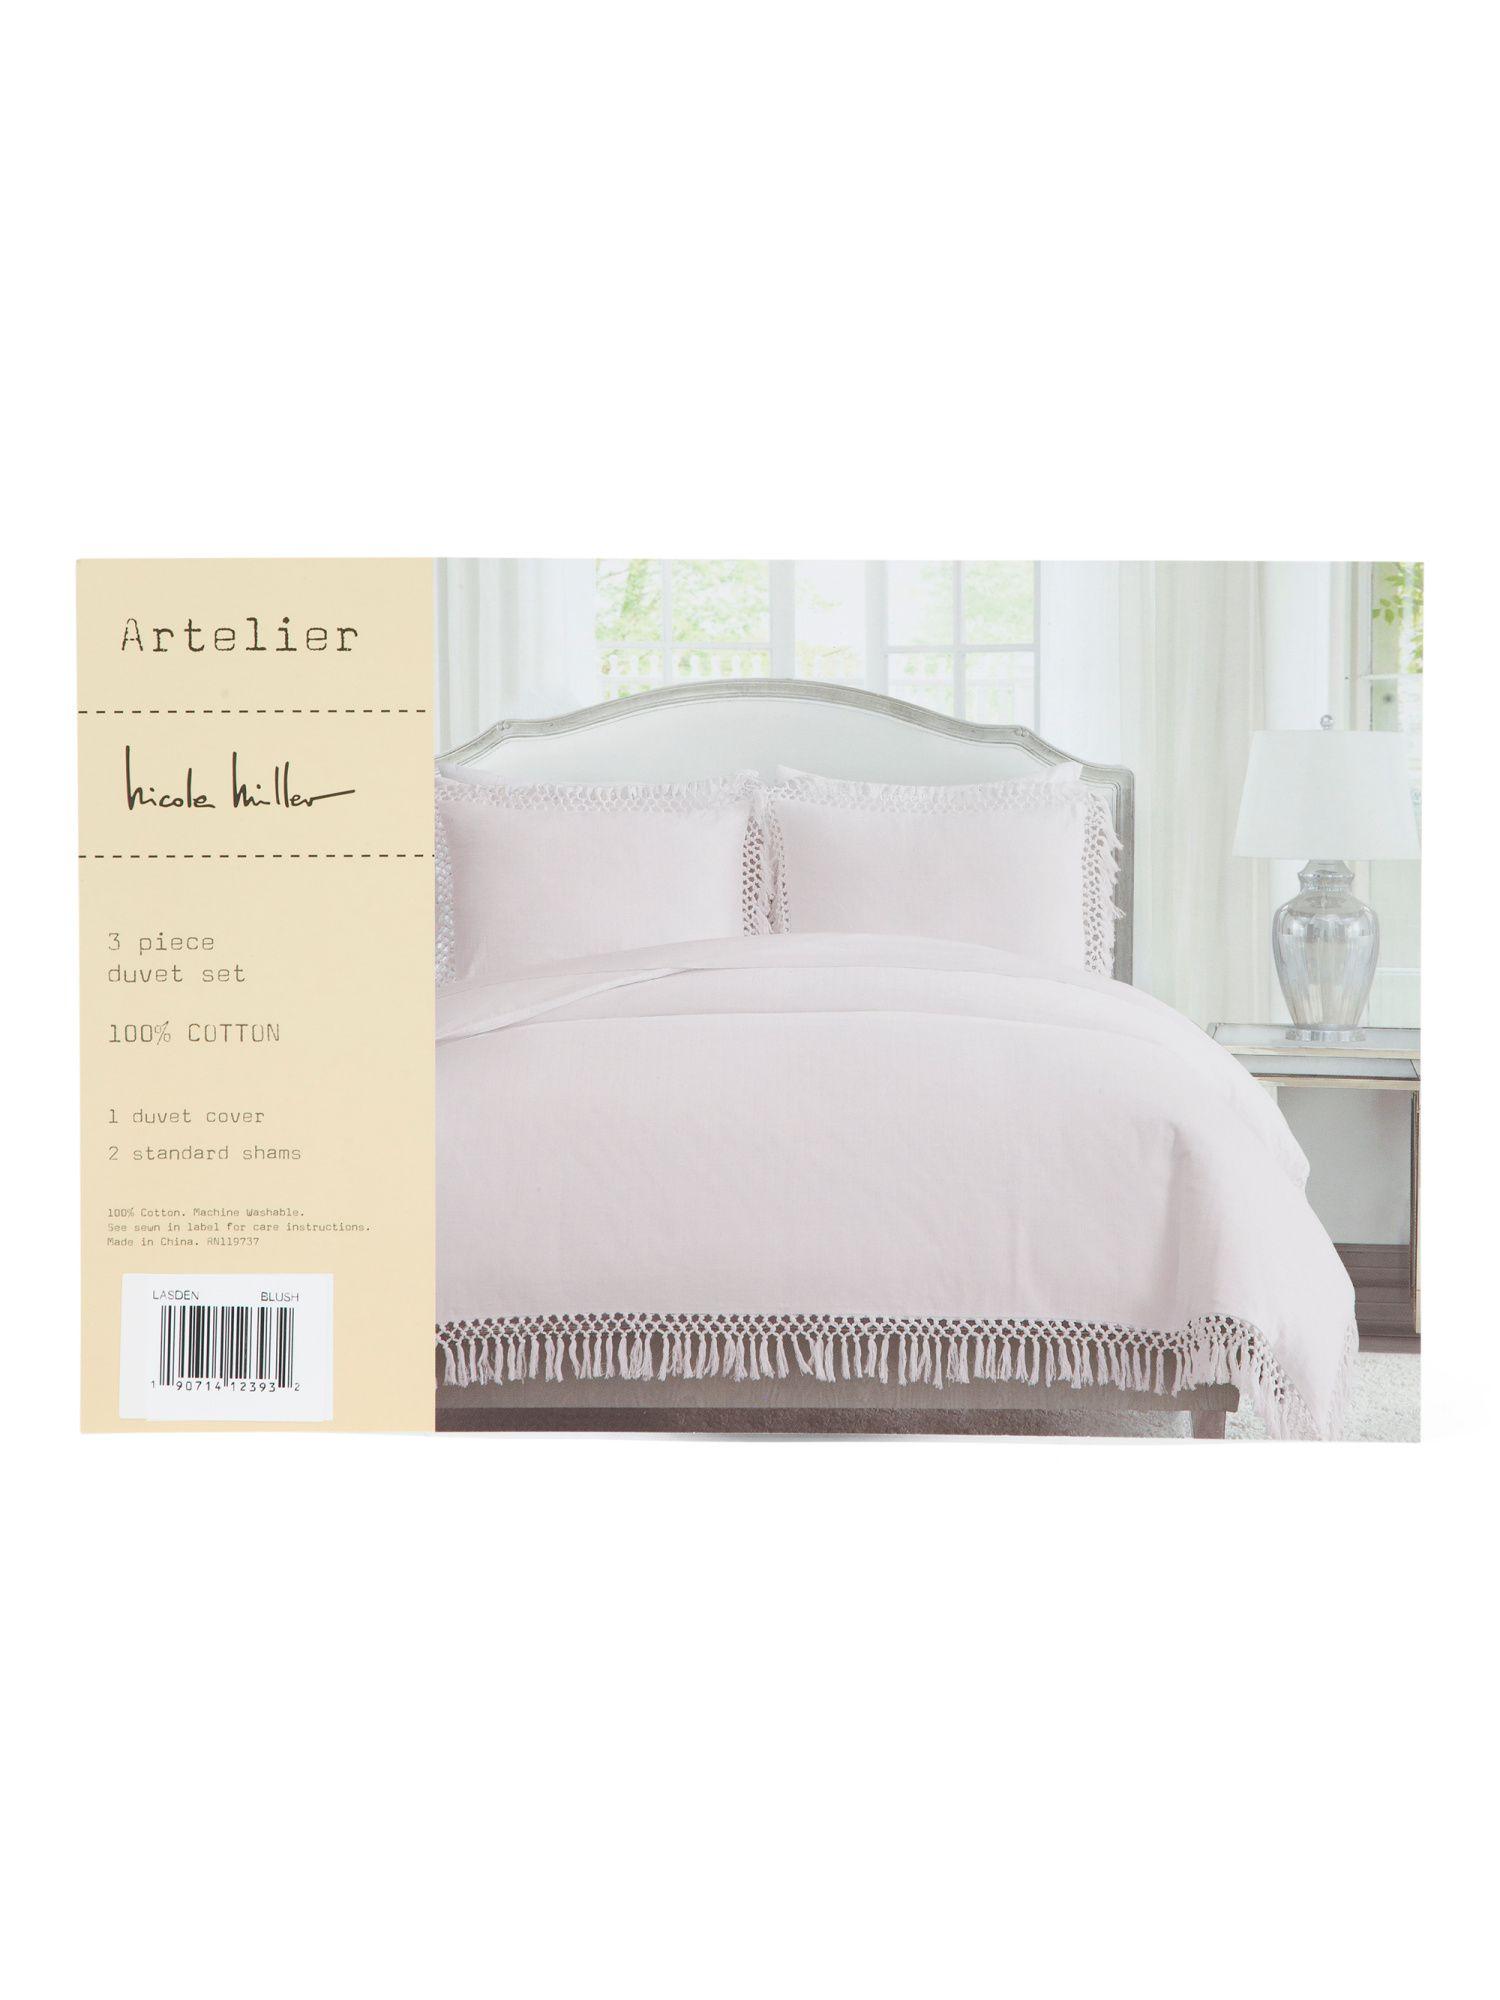 Nicole Miller Bedding Tj Maxx : nicole, miller, bedding, Lasden, Duvet, Bedroom, T.J.Maxx, Sets,